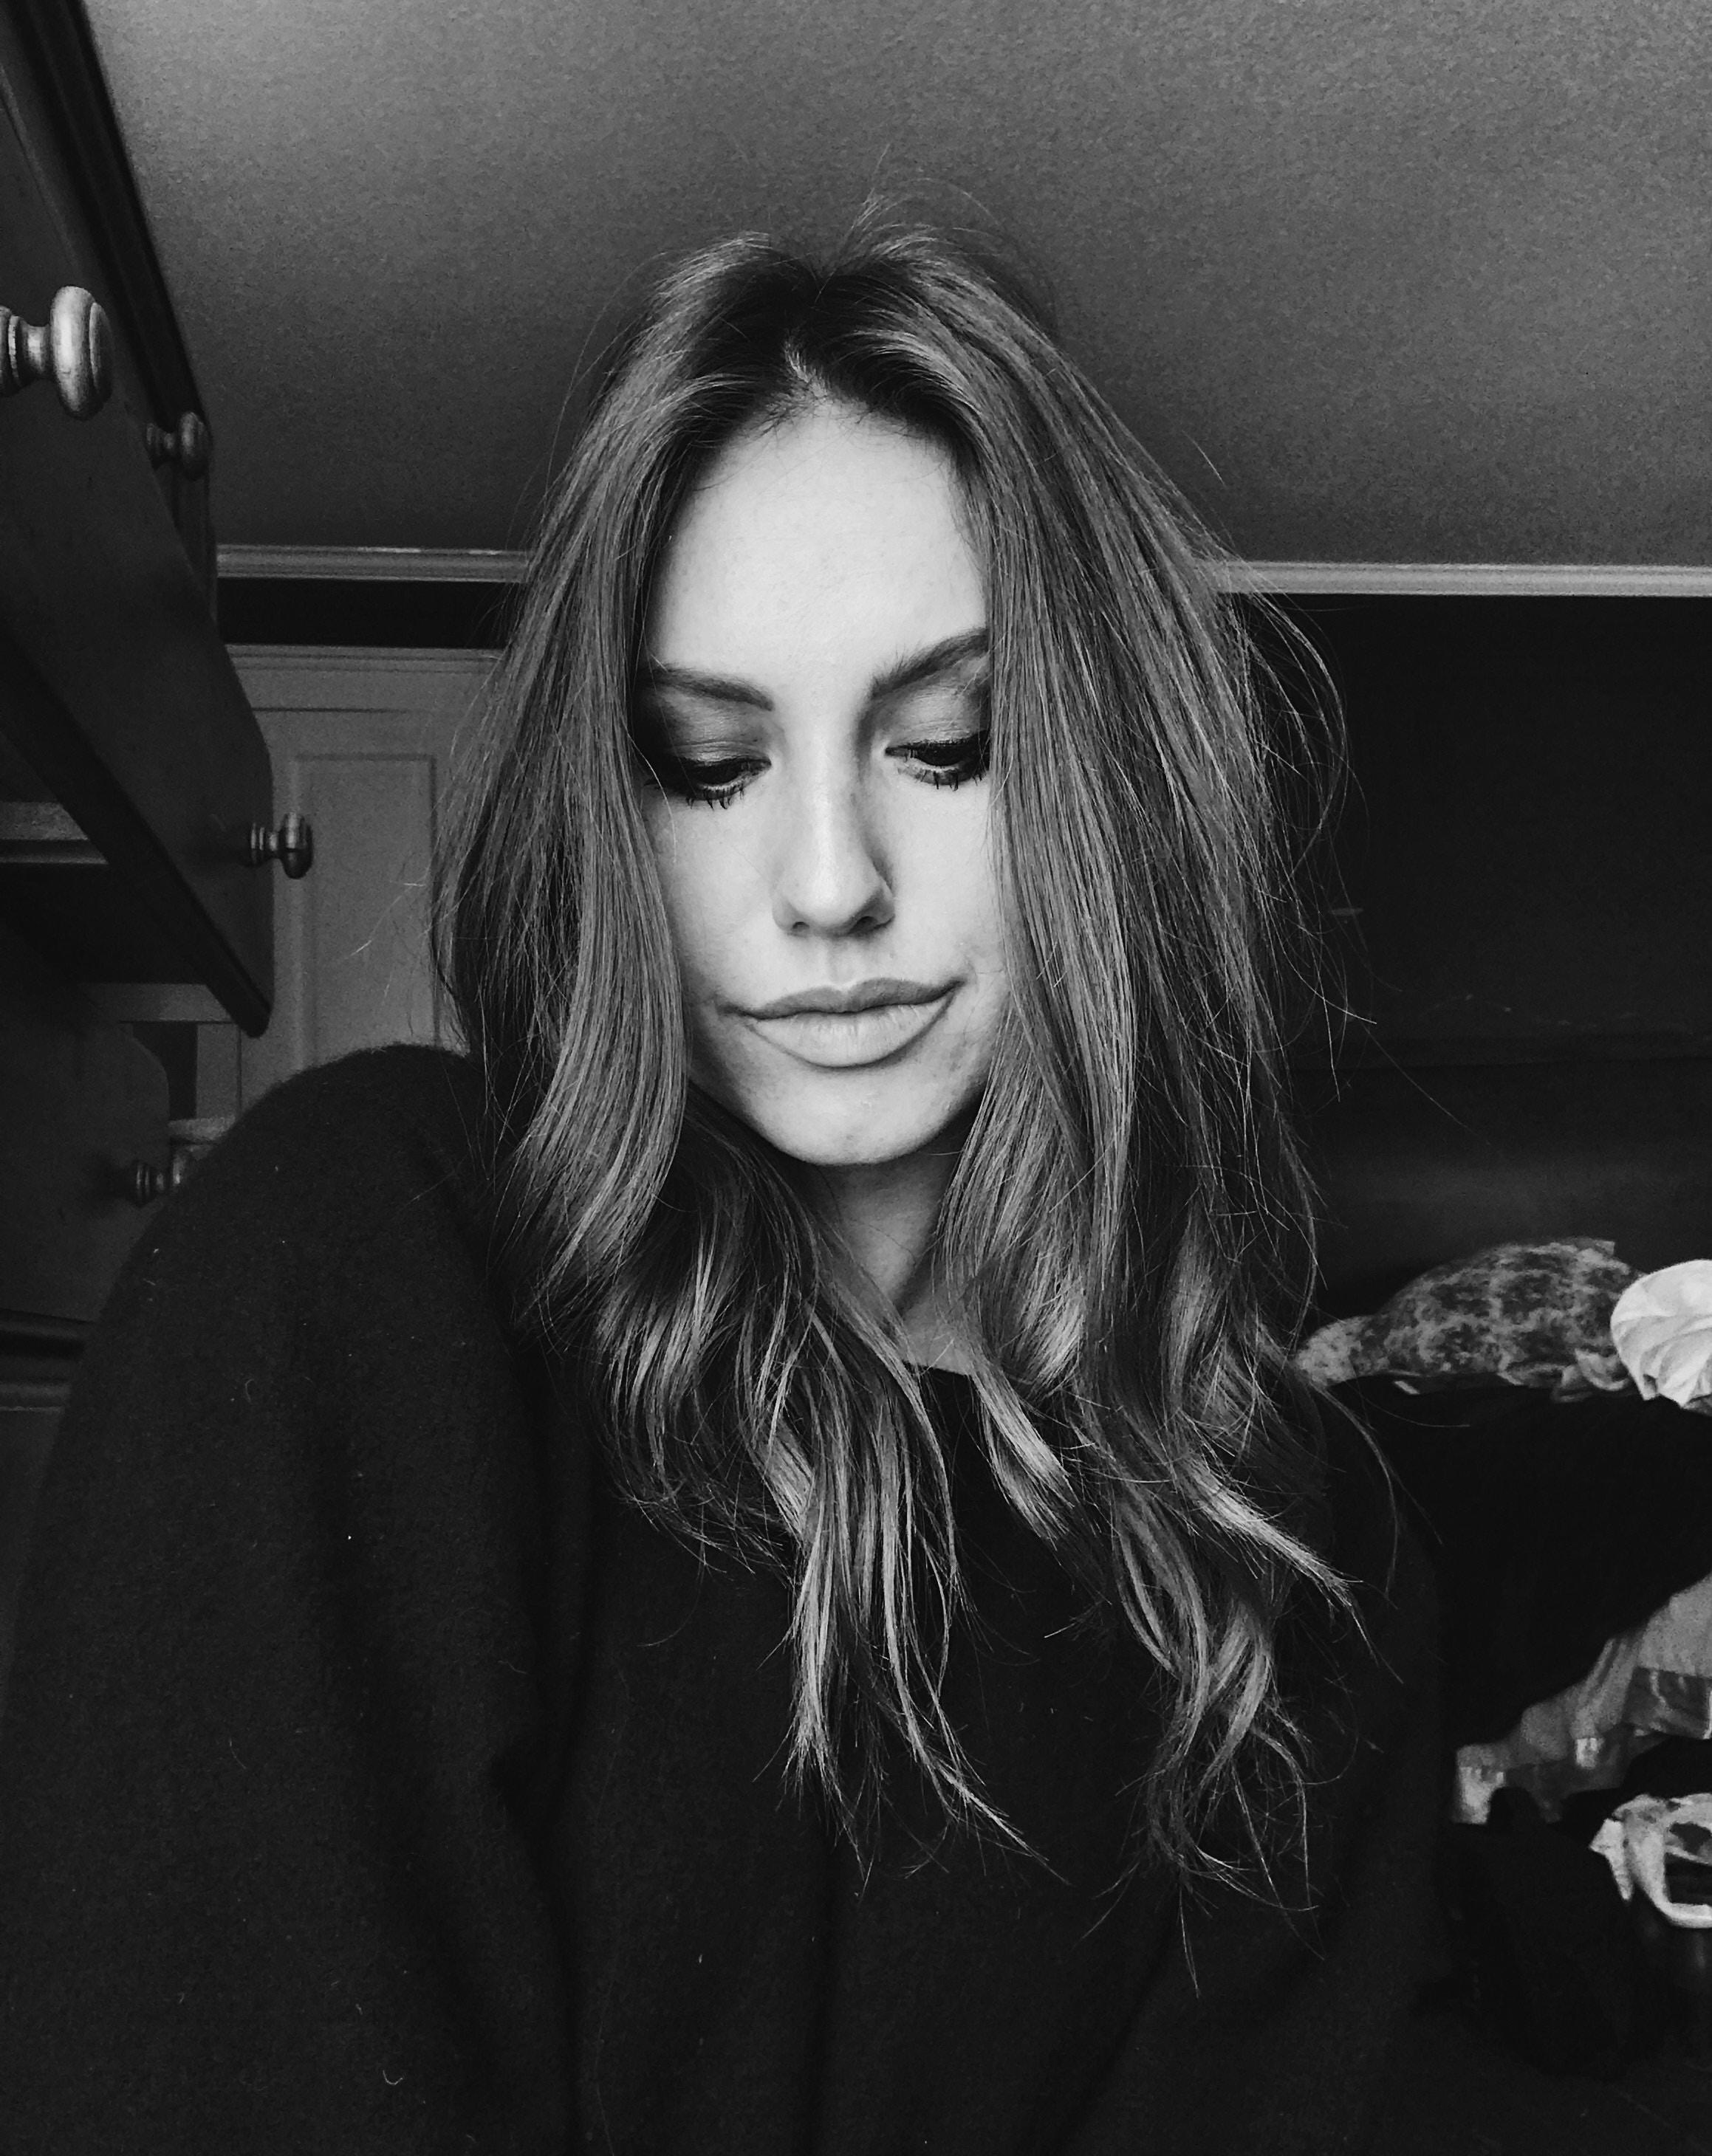 Go to emma valerio's profile